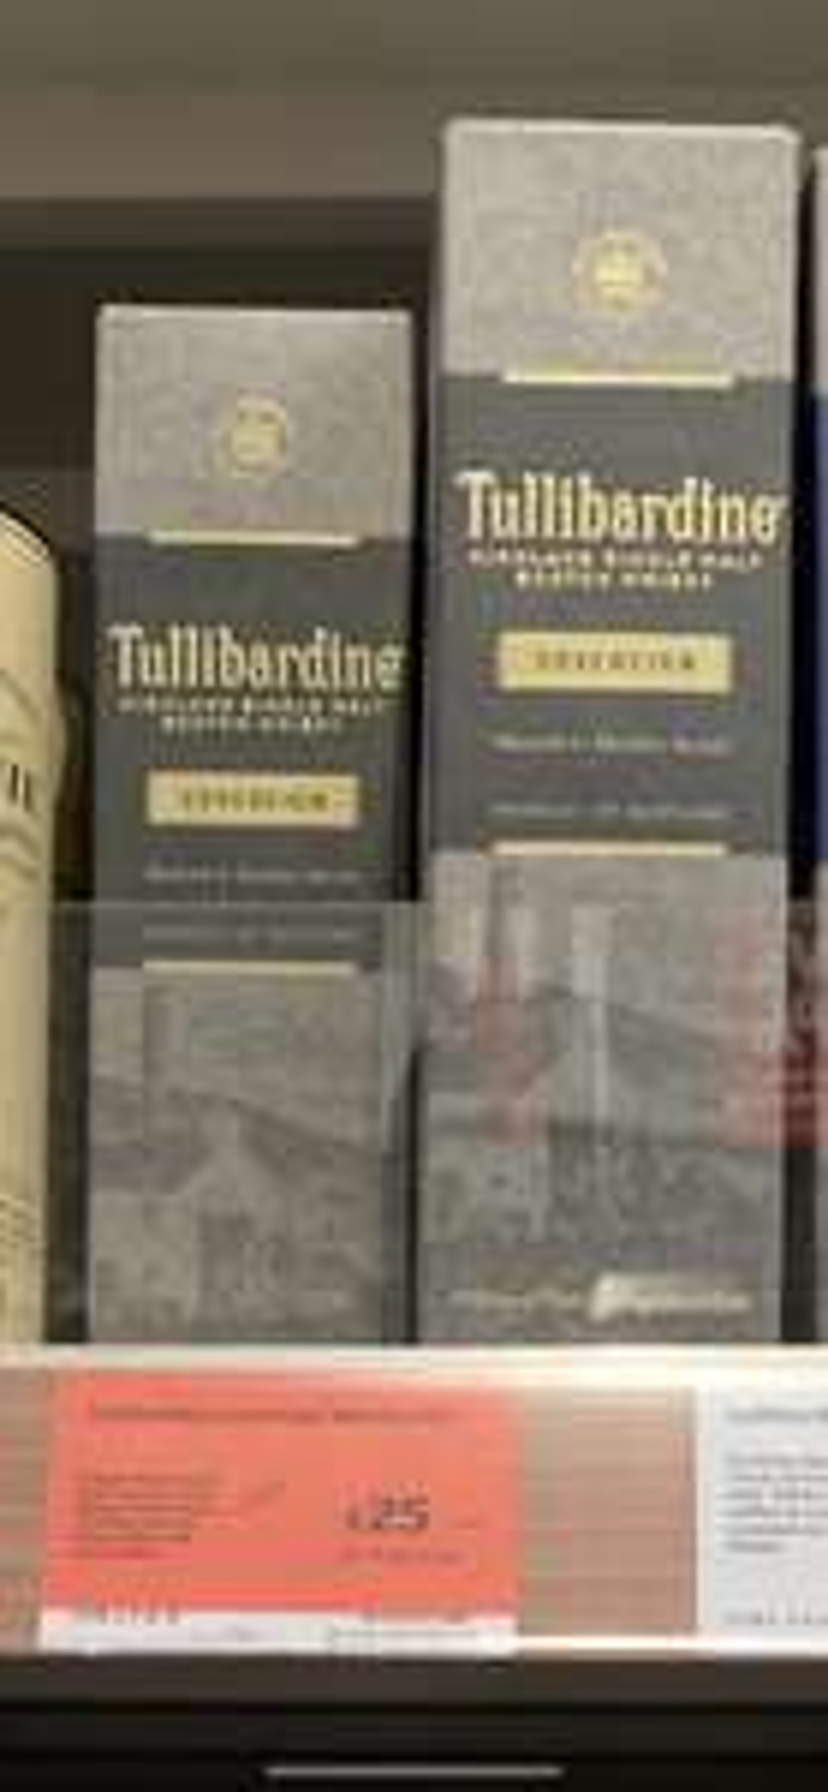 Tullarbardine Sovereign - £25 Instore @ Sainsbury's (London)